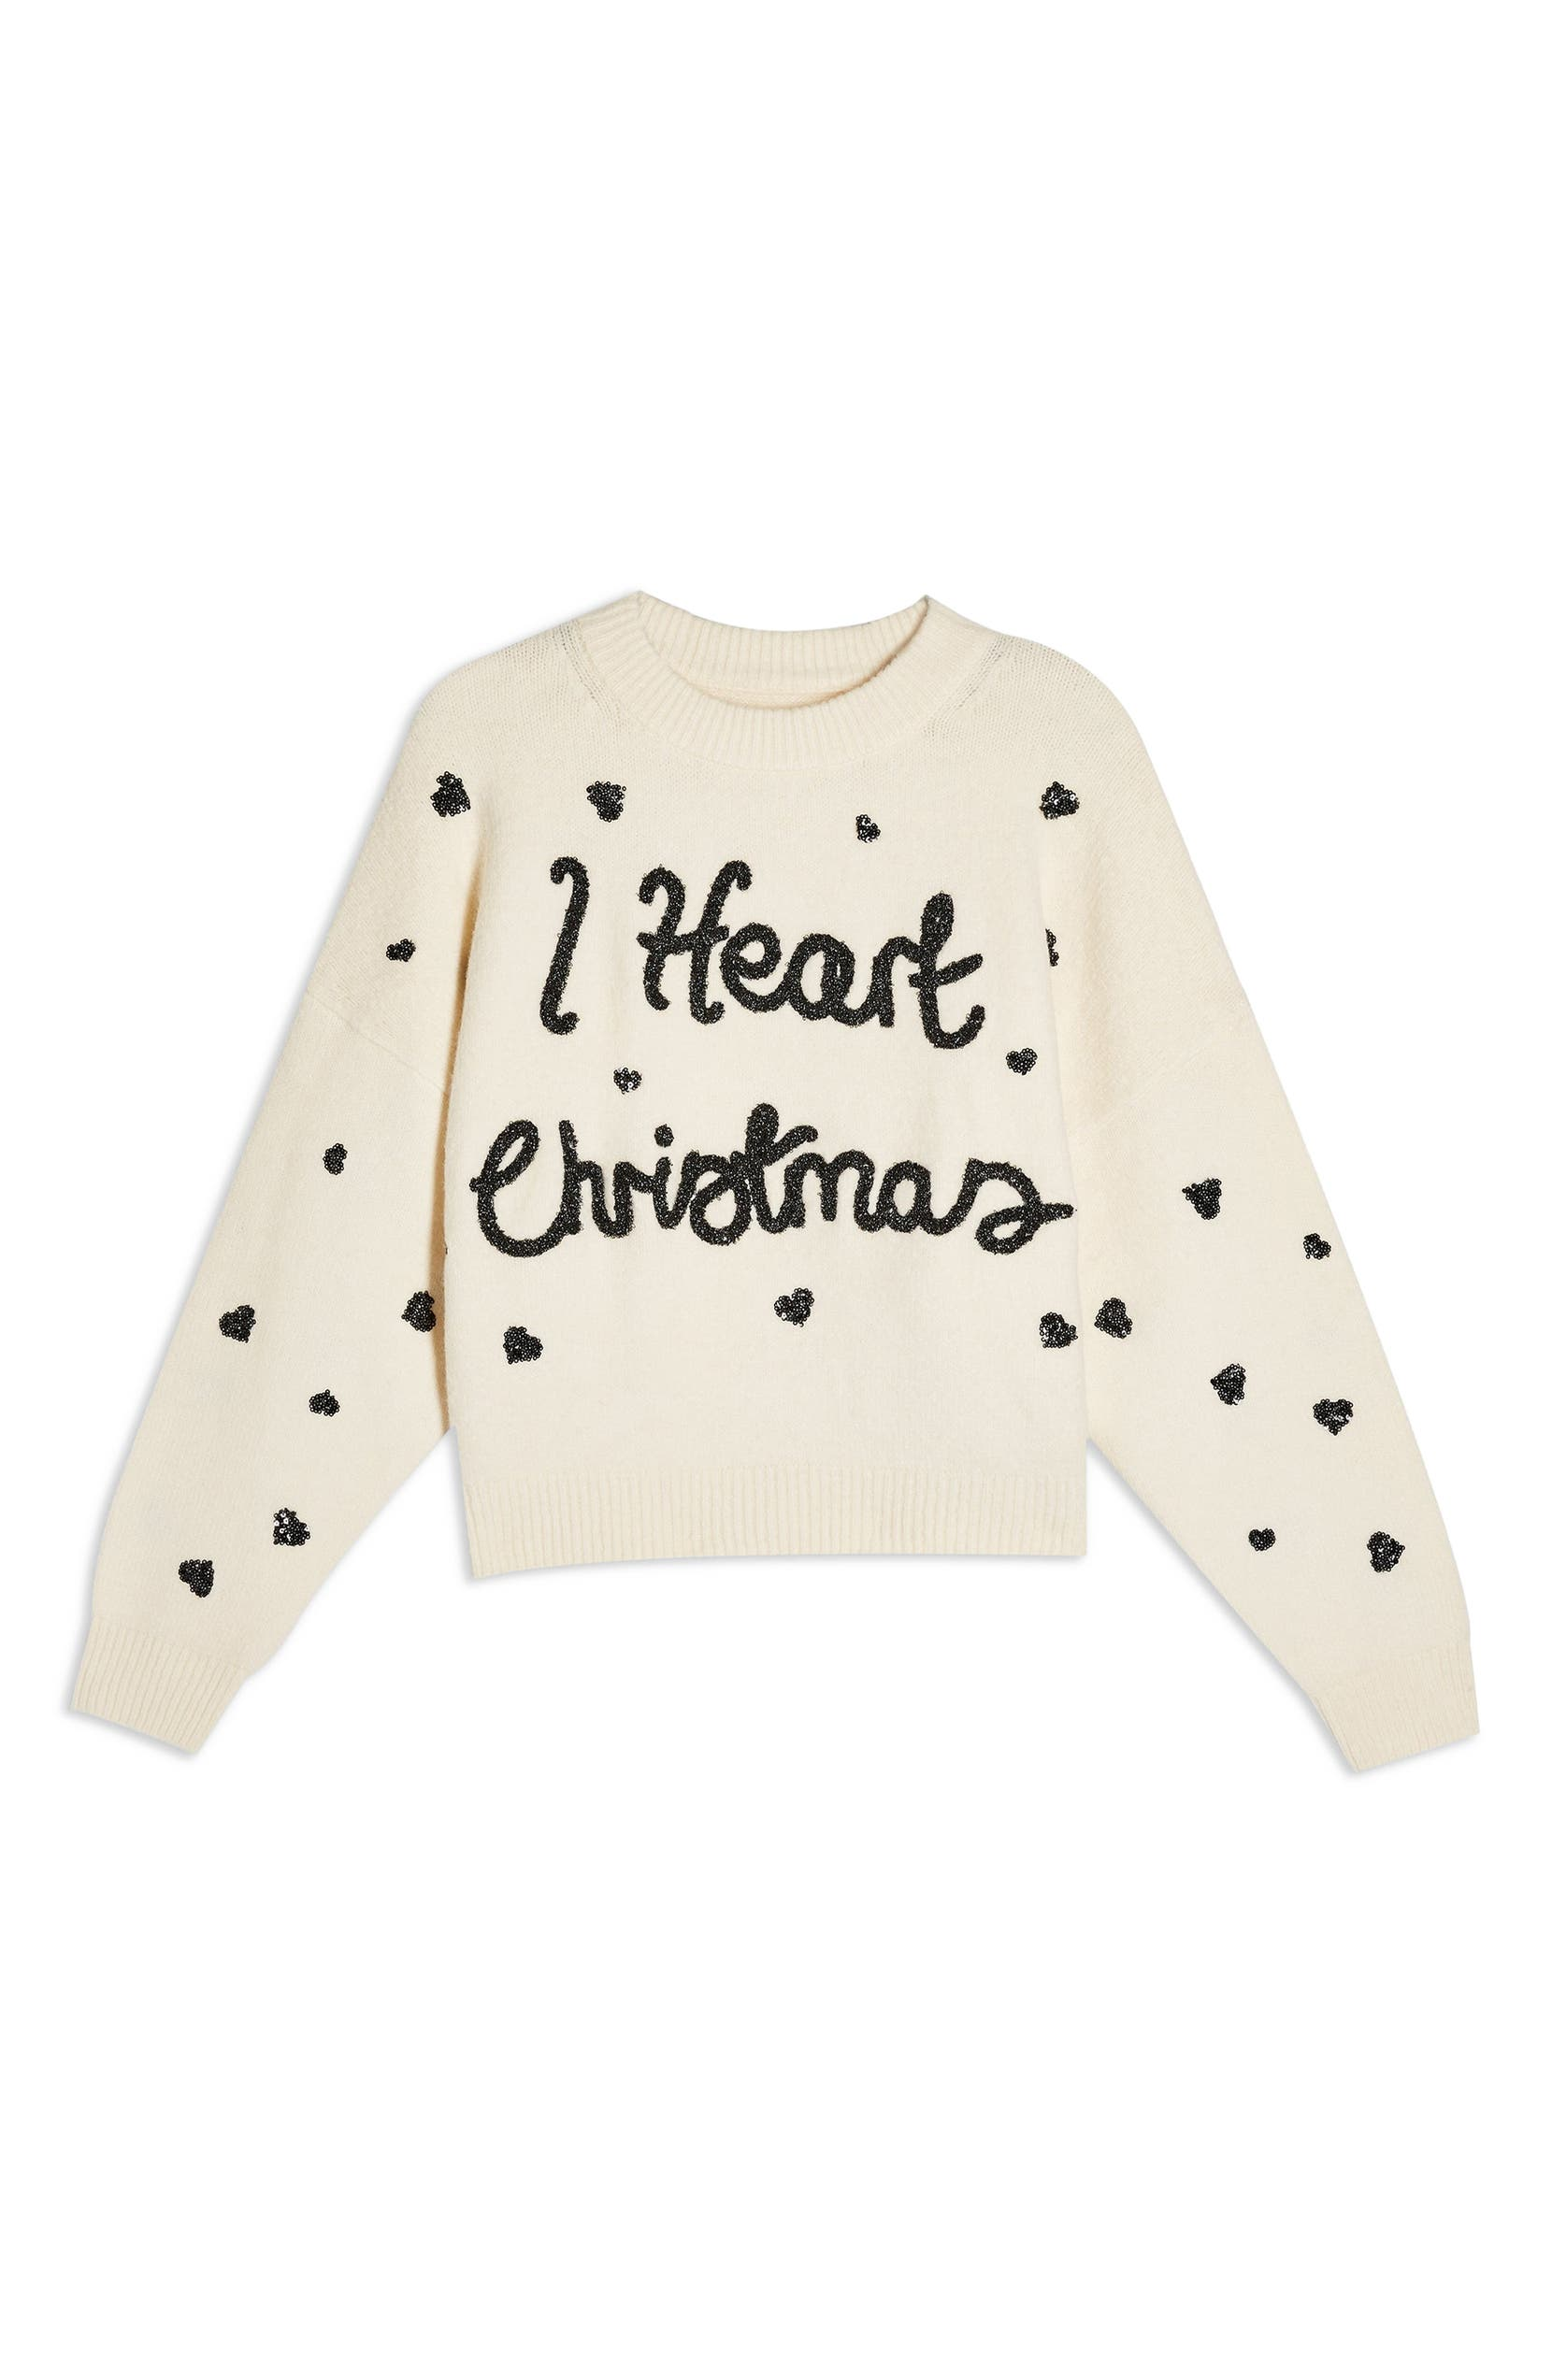 I Heart Christmas Sweater